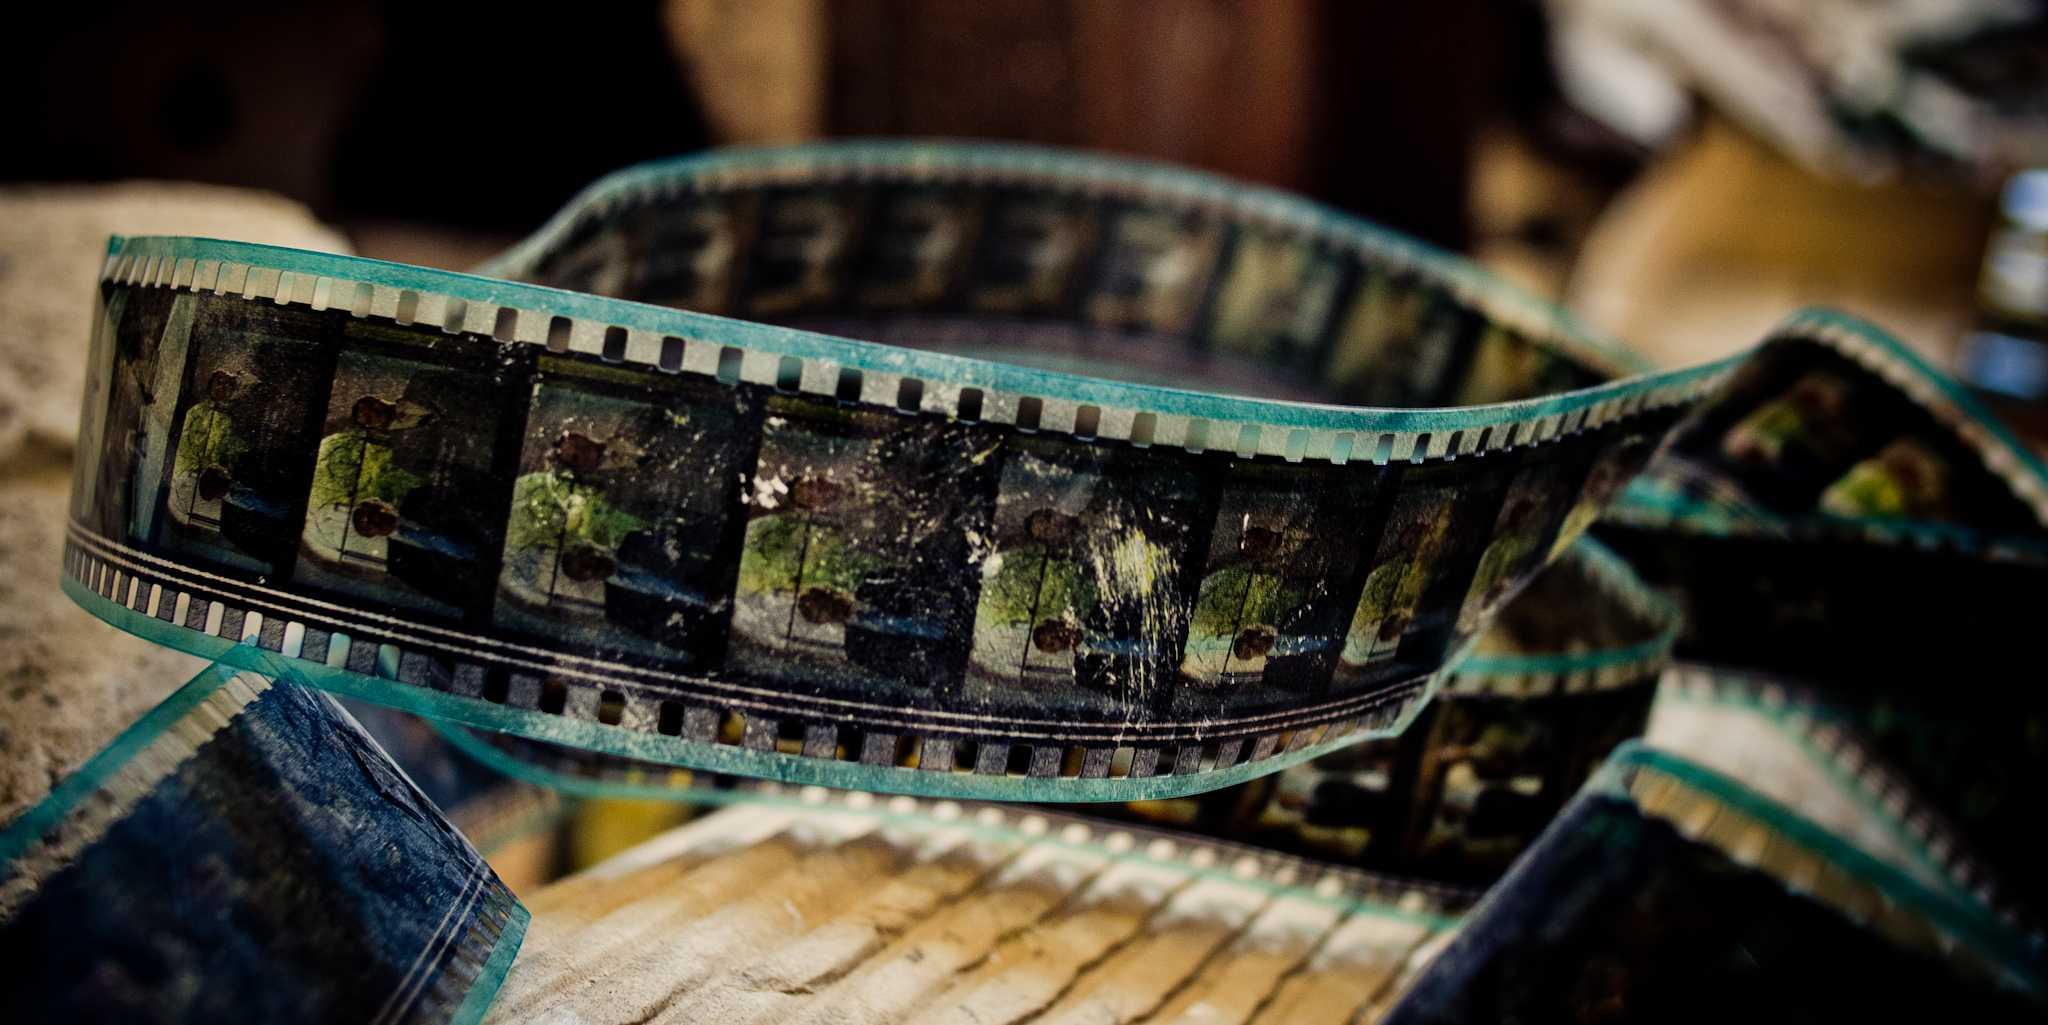 Annual Superfest Disability Film Festival hosts screening